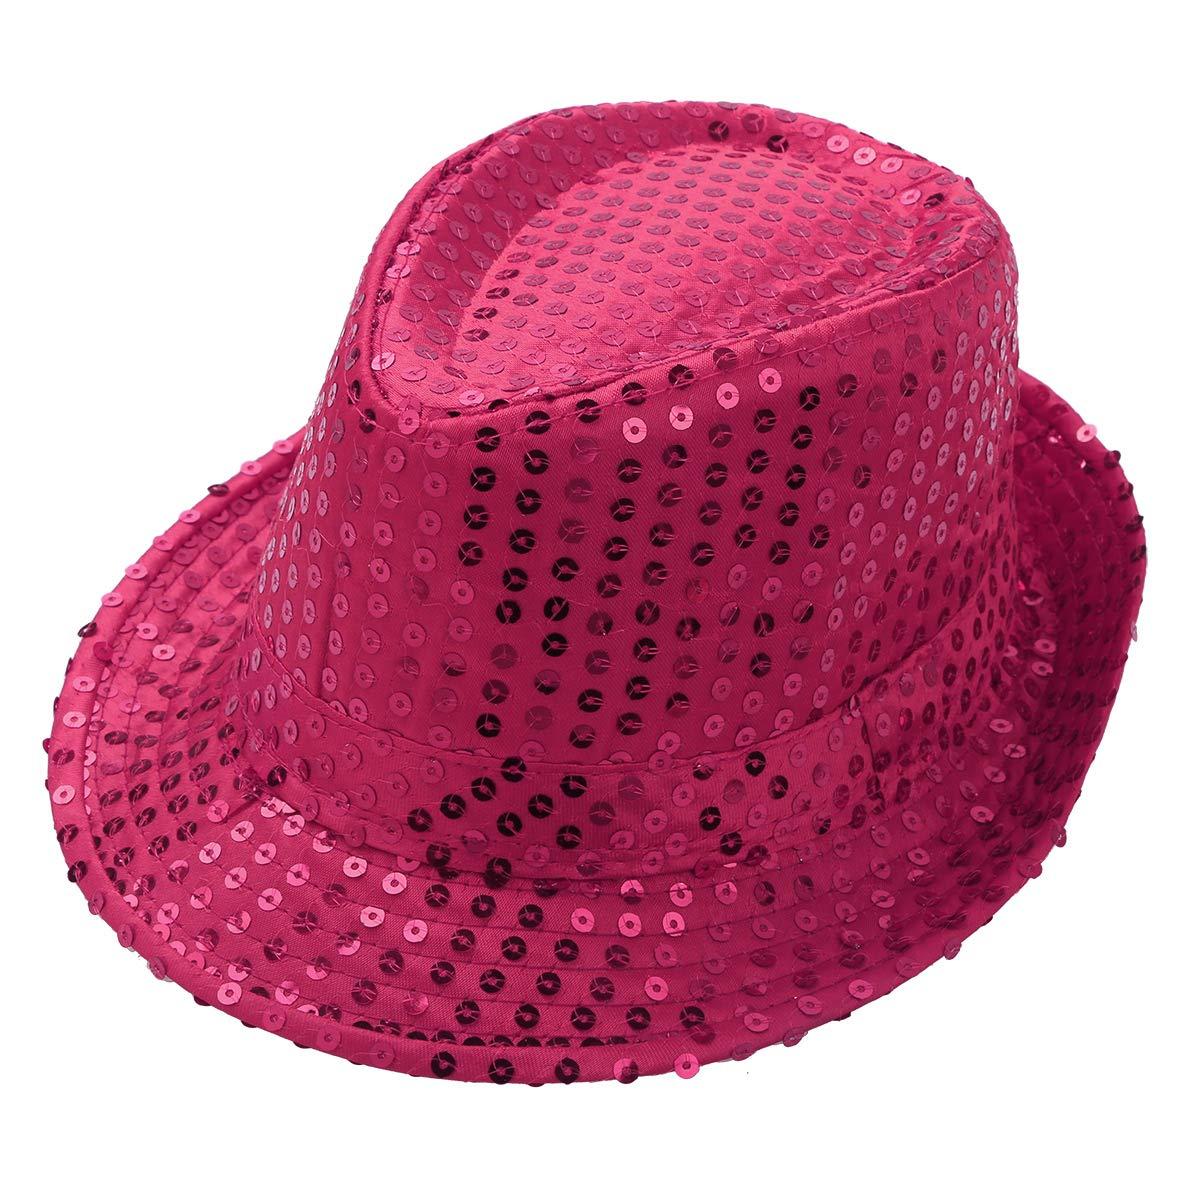 inlzdz Kids Boys Girls Sequins Fedora Hat Hip Hop Latin Jazz Street Dance Costume Accessories Cap